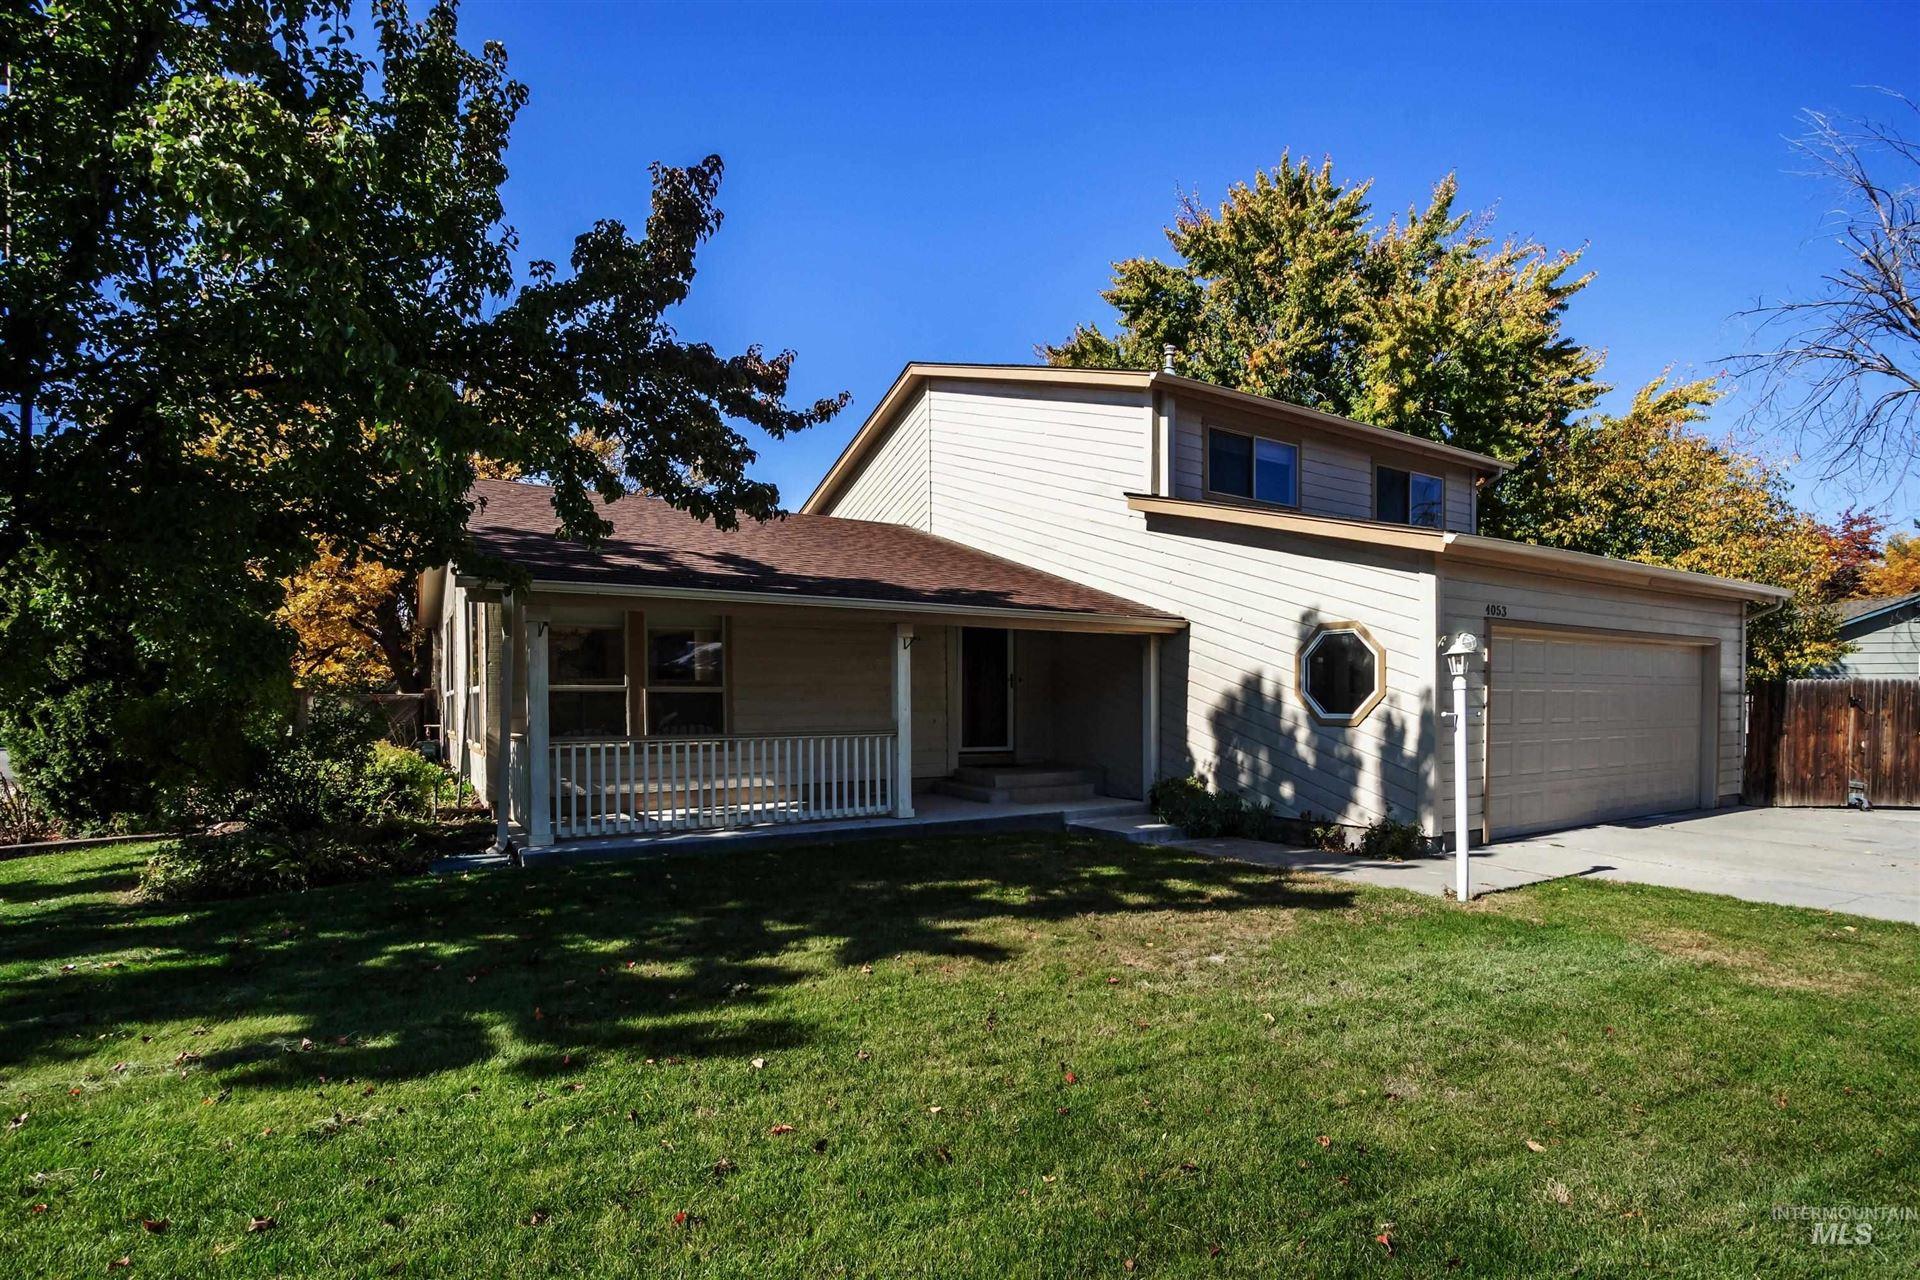 4053 N Tattenham, Boise, ID 83713 - MLS#: 98822863